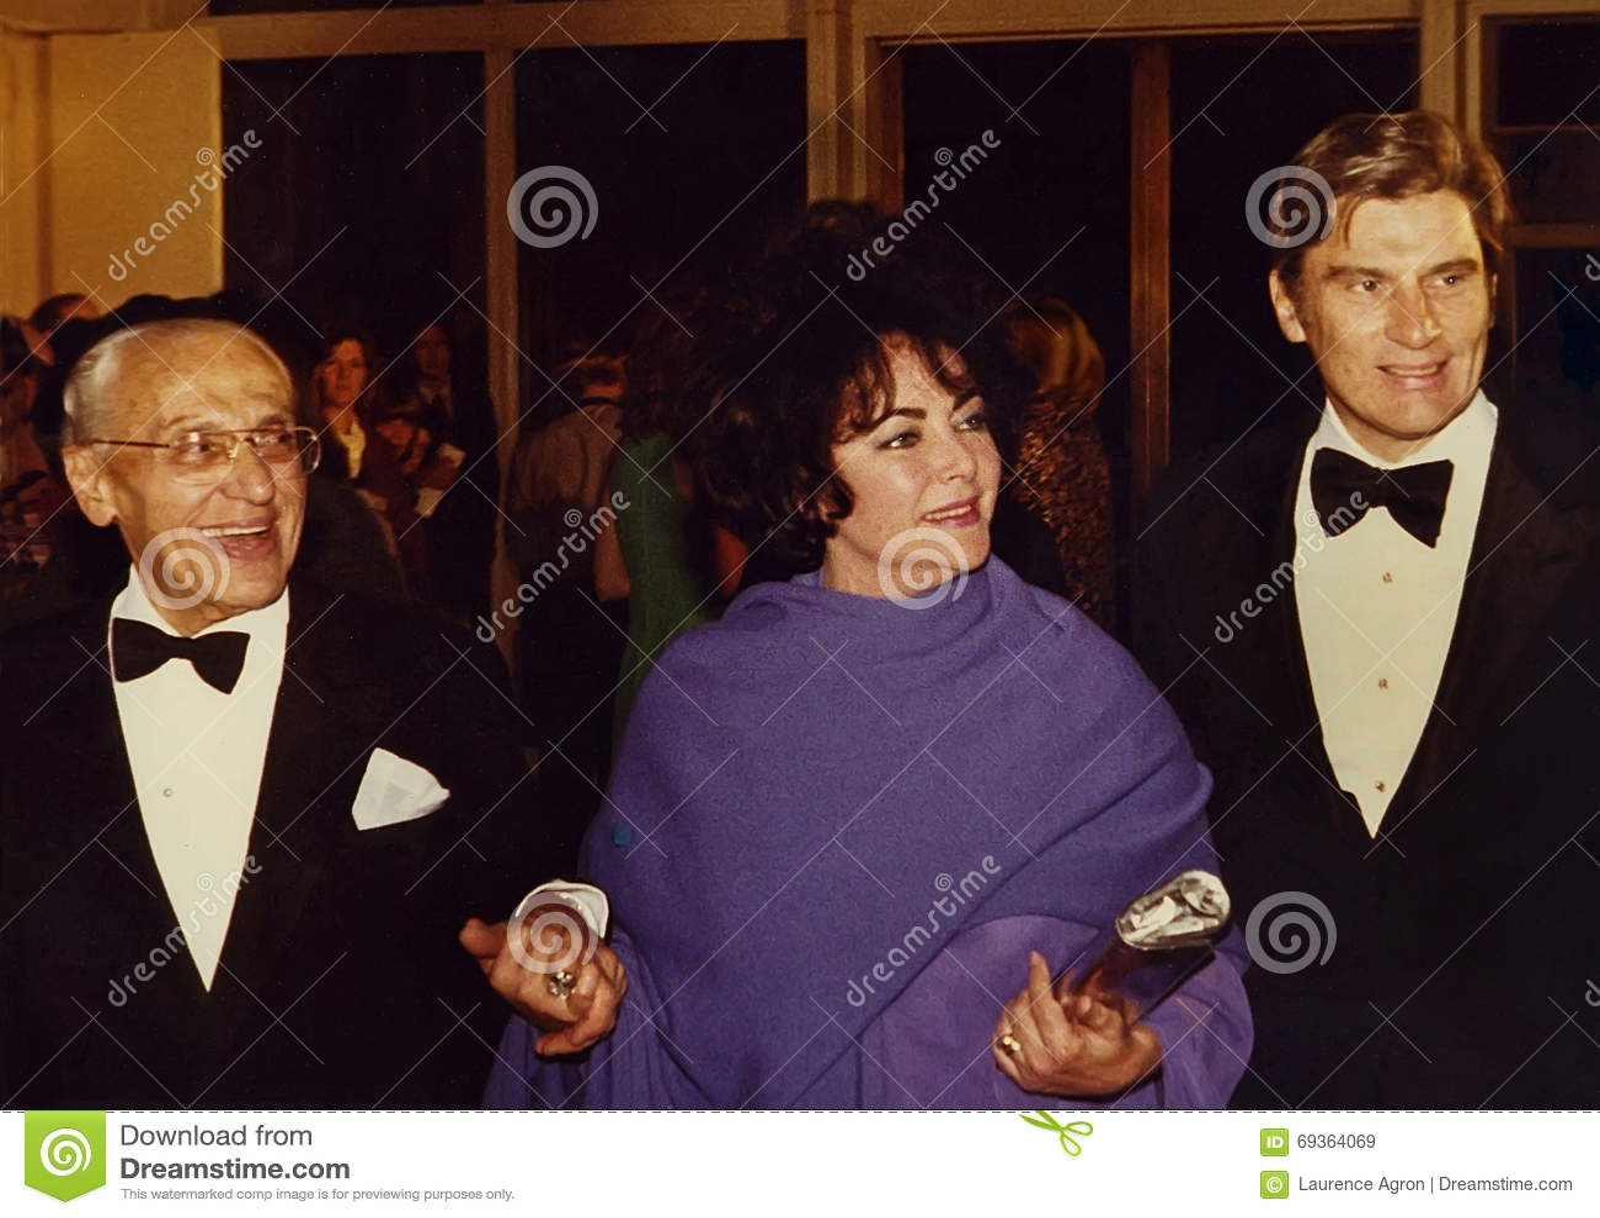 George Cukor, Elizabeth Taylor, and John Warner